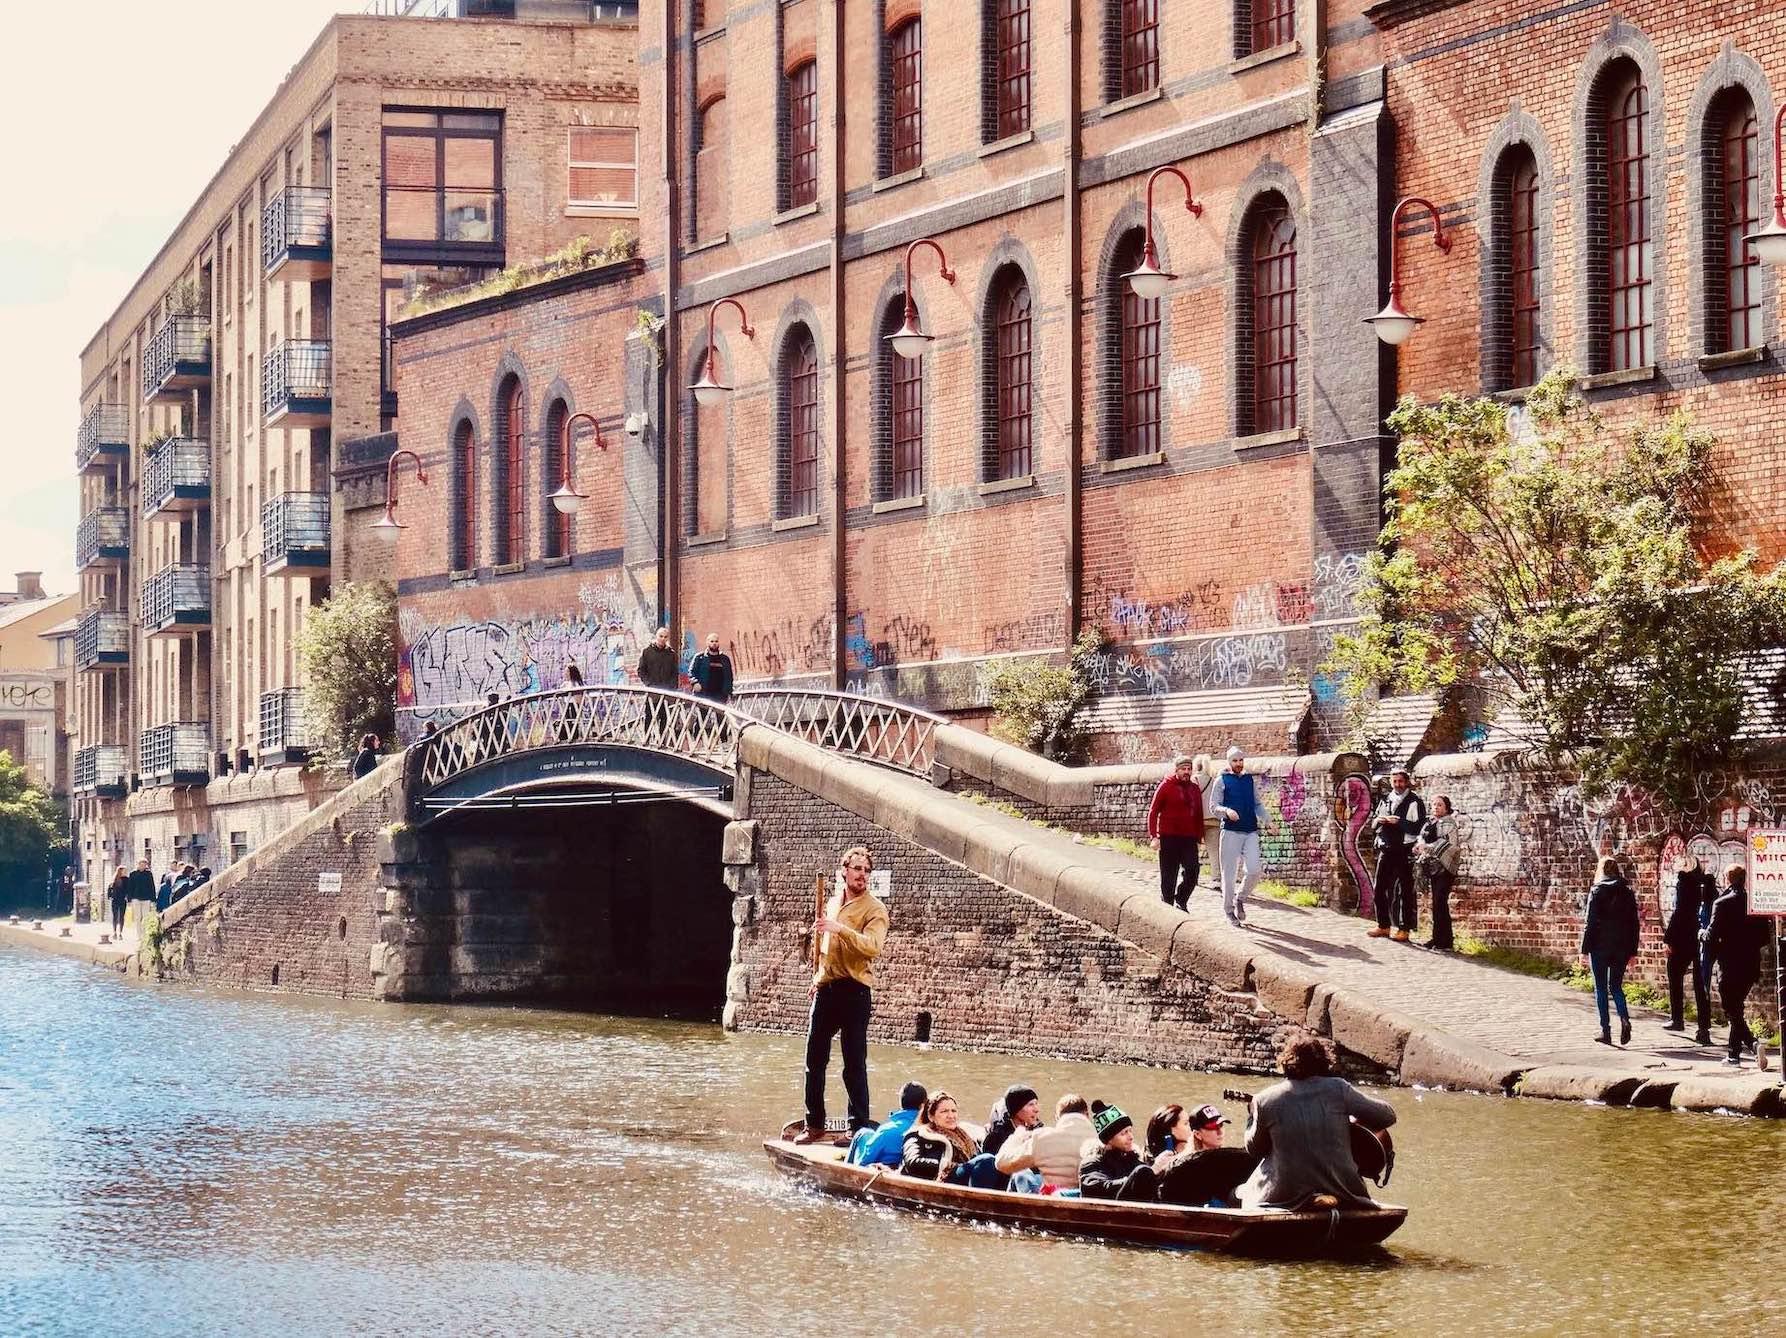 Camden Lock canal tour, London.